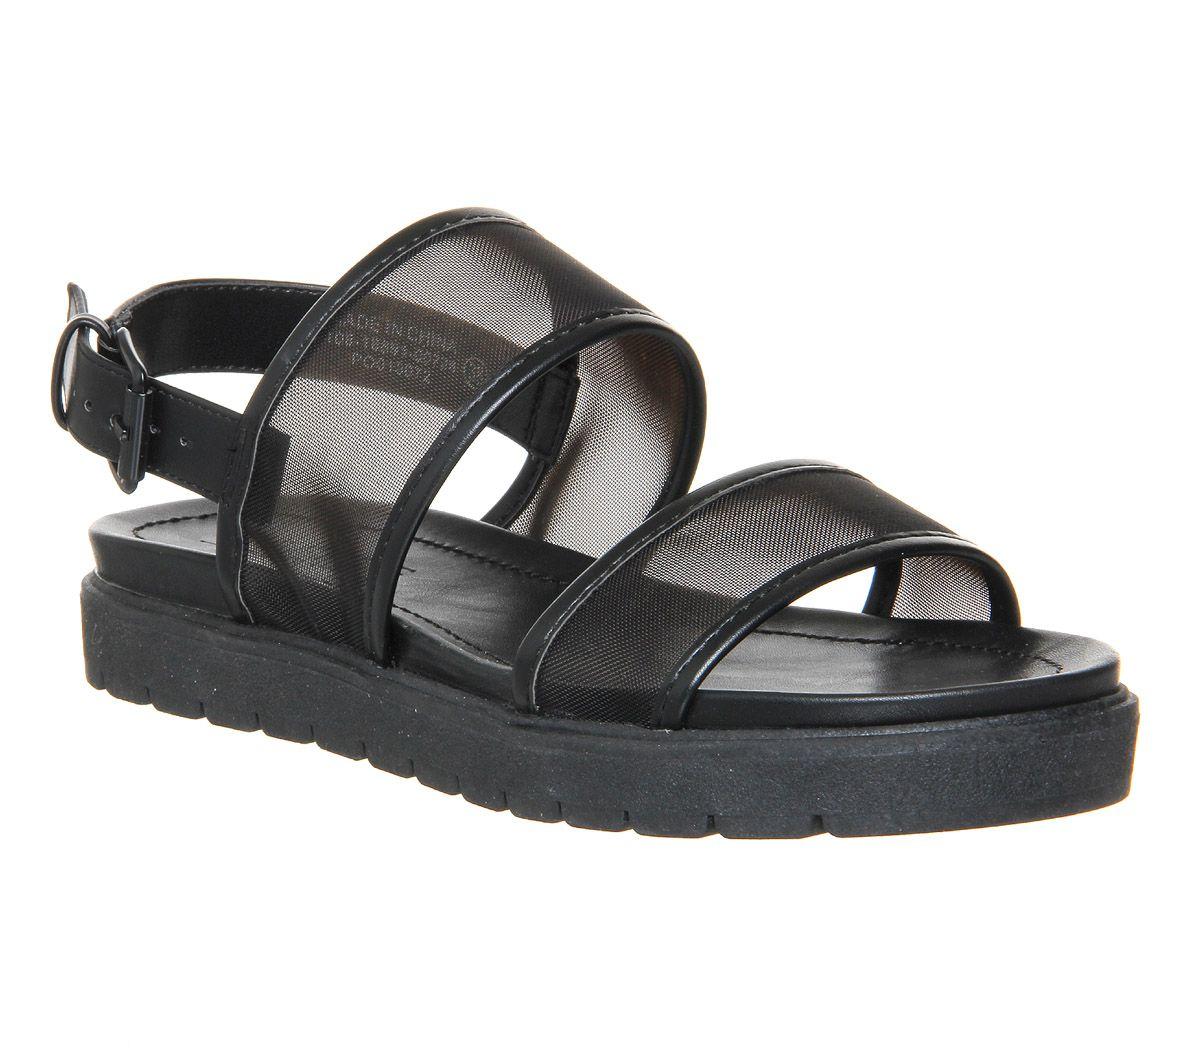 Black mesh sandals - Office Optic Double Strap Sling Sandal Black Mesh Sandals